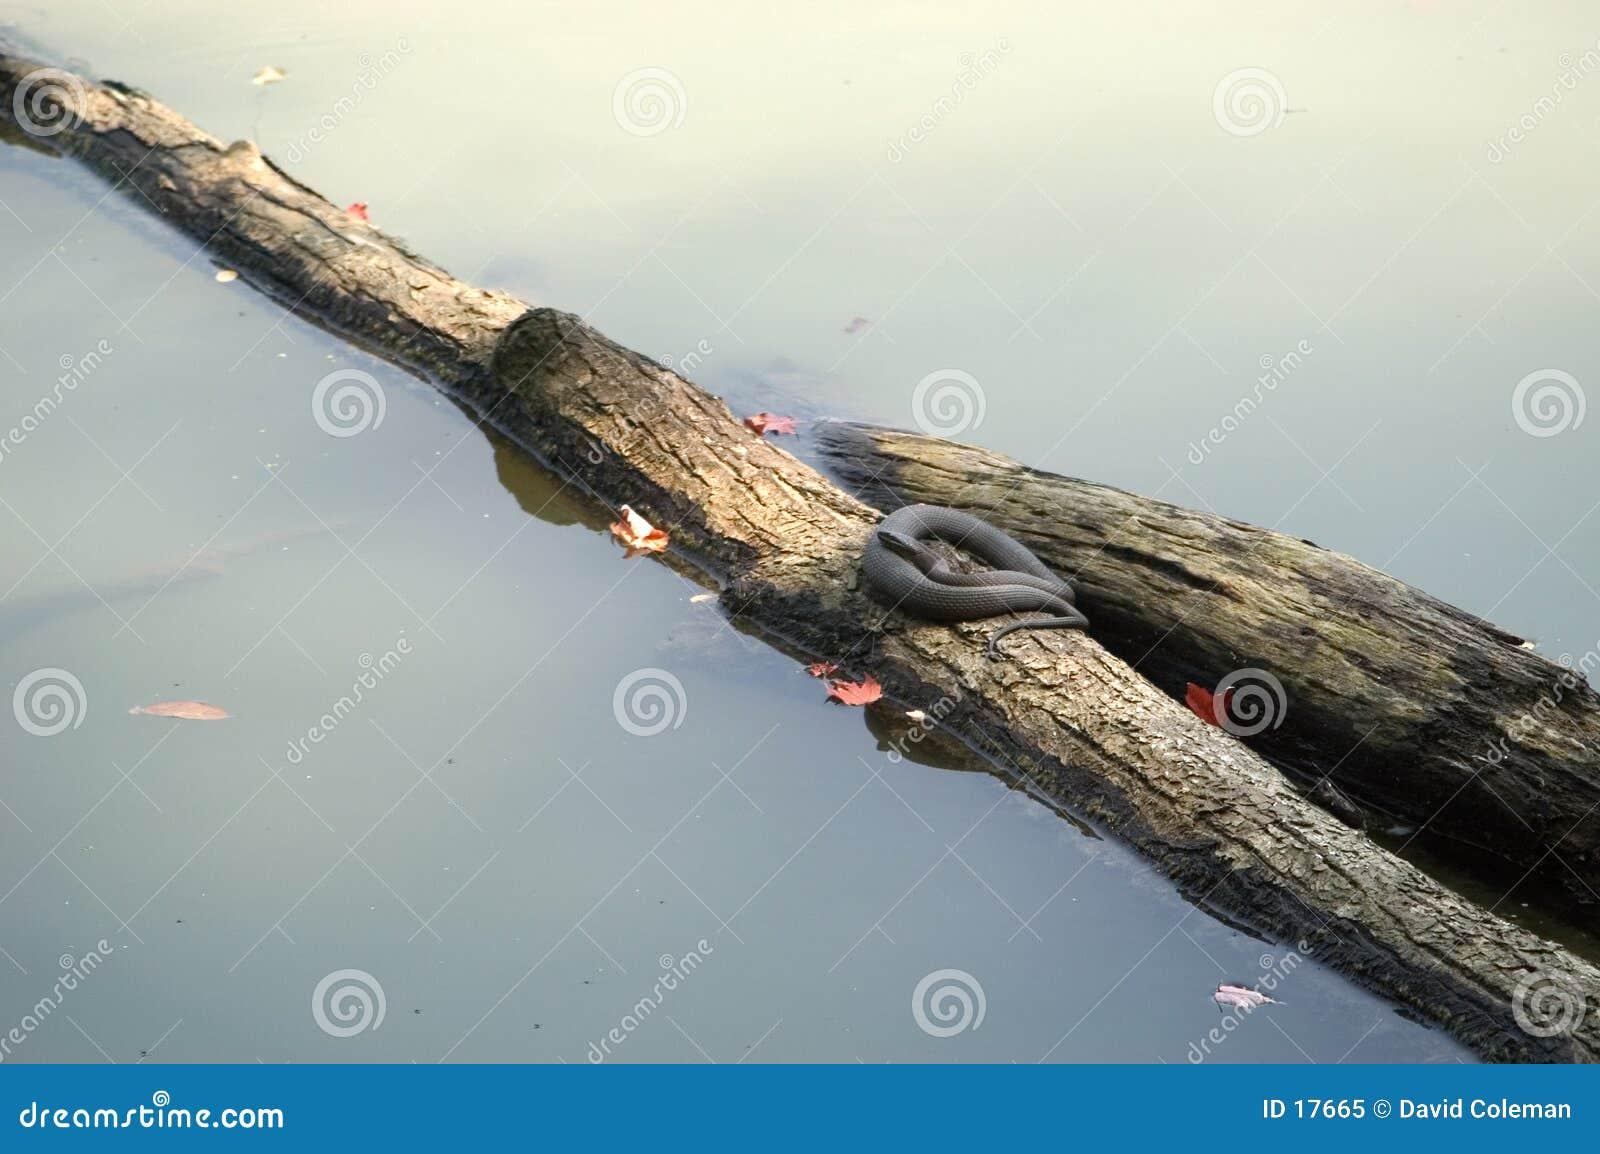 Log sunning